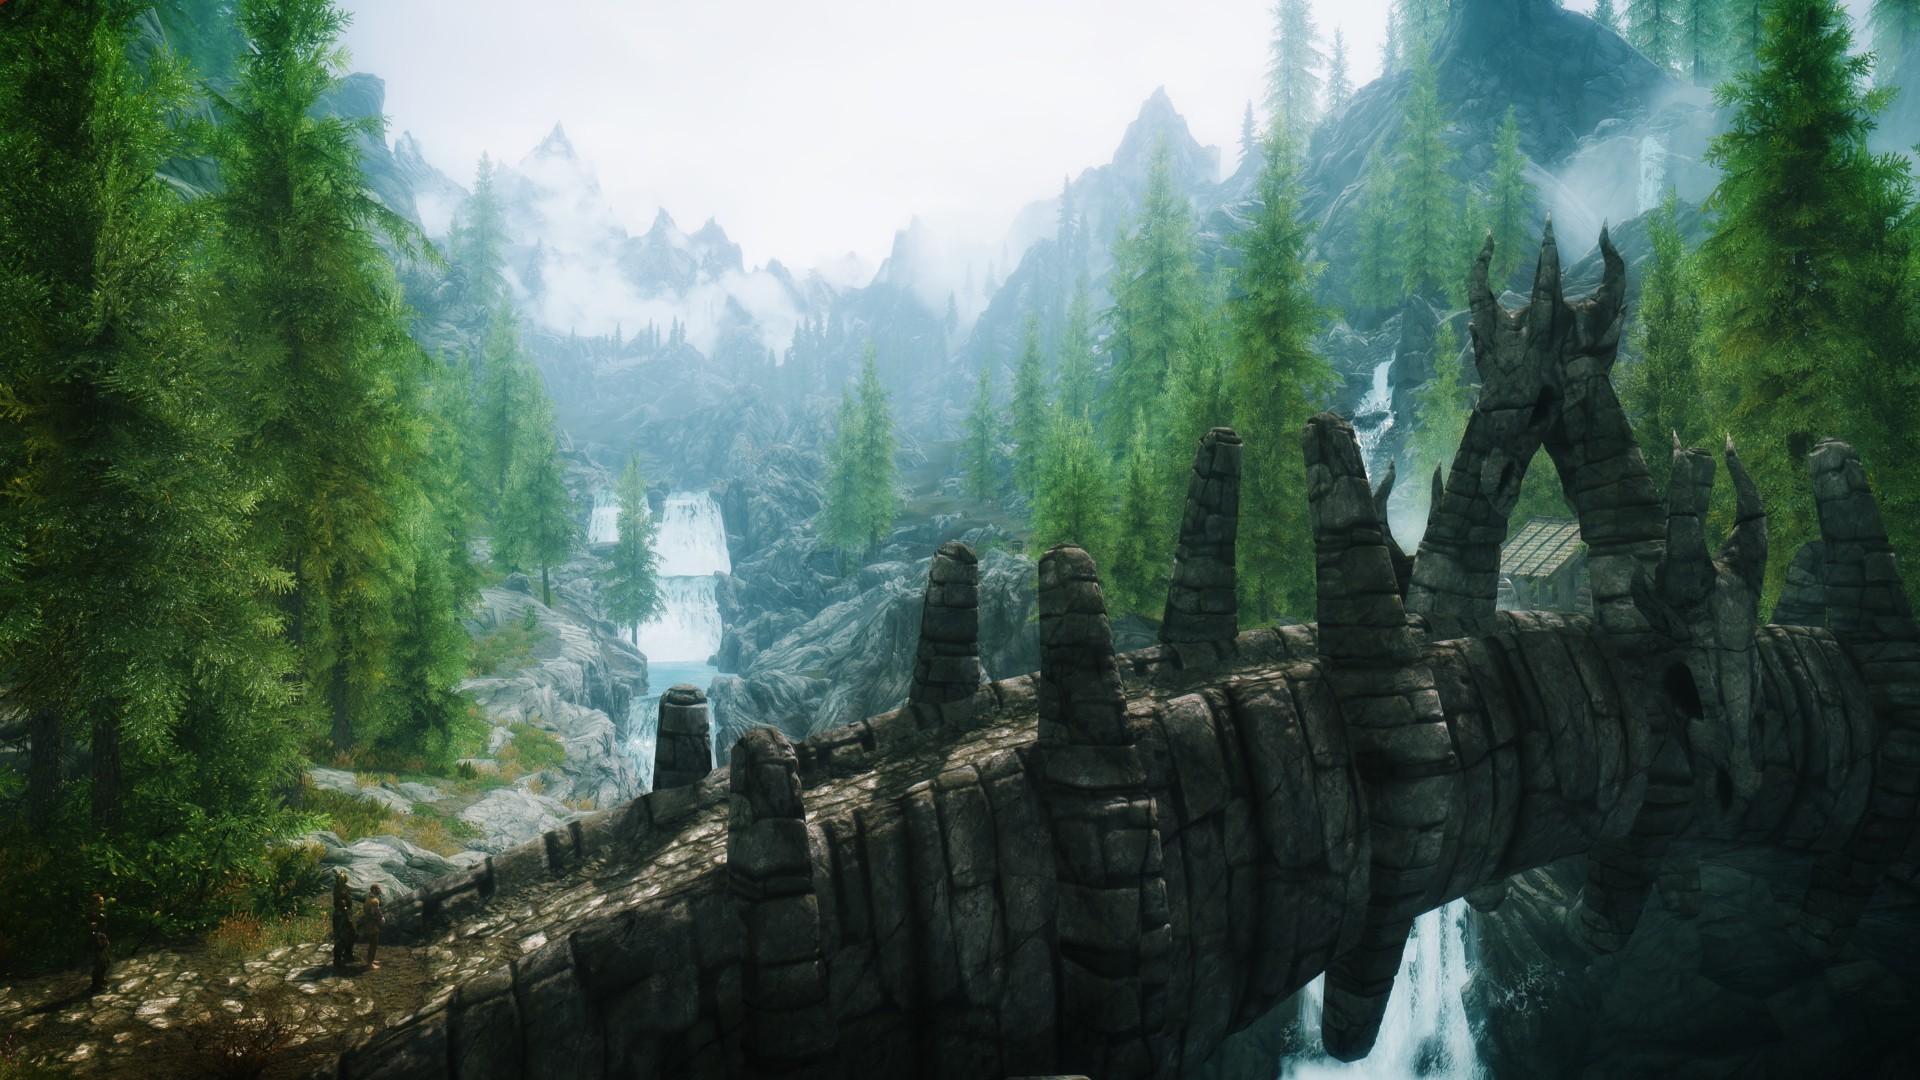 Skyrim Landscape Photo.